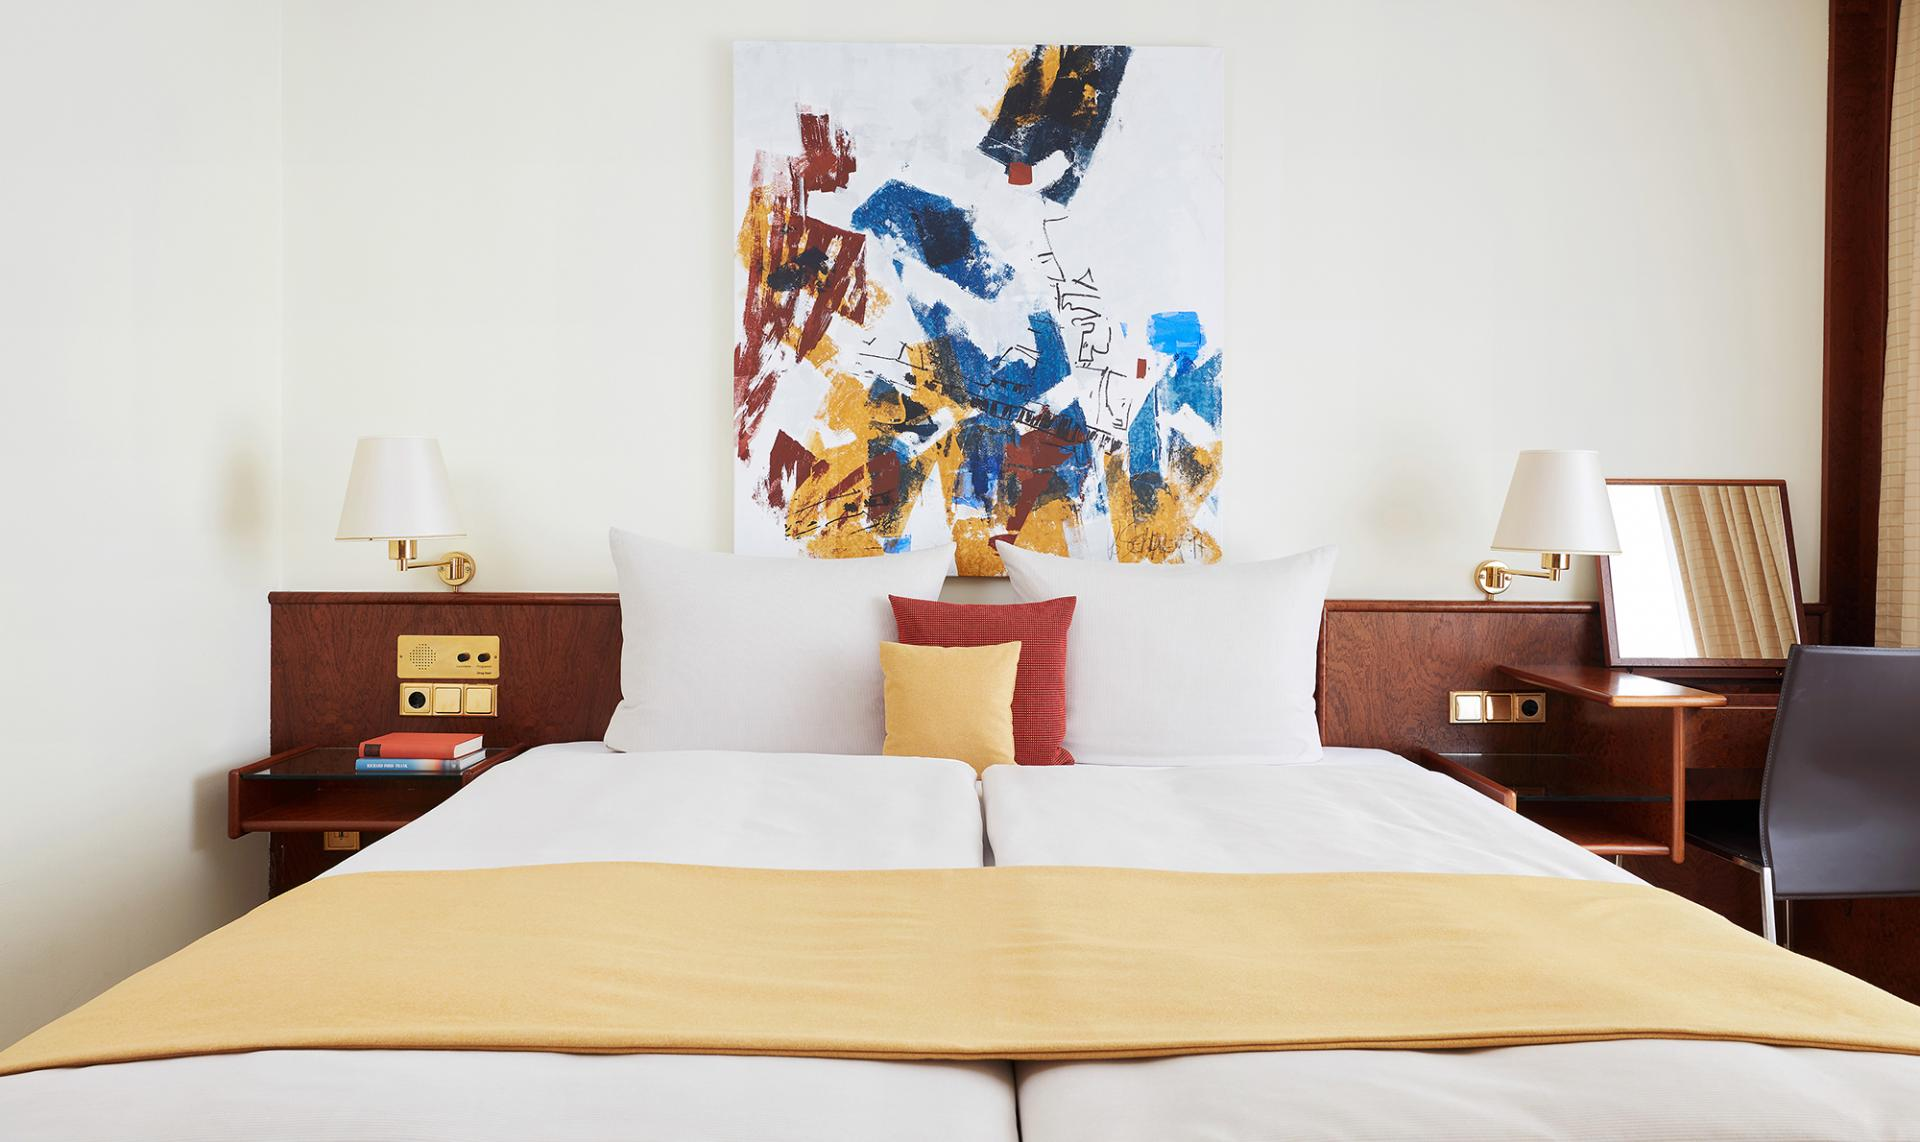 Spacious bed at Living Hotel Grosser Kurfurst Apartments, Berlin Mitte, Berlin